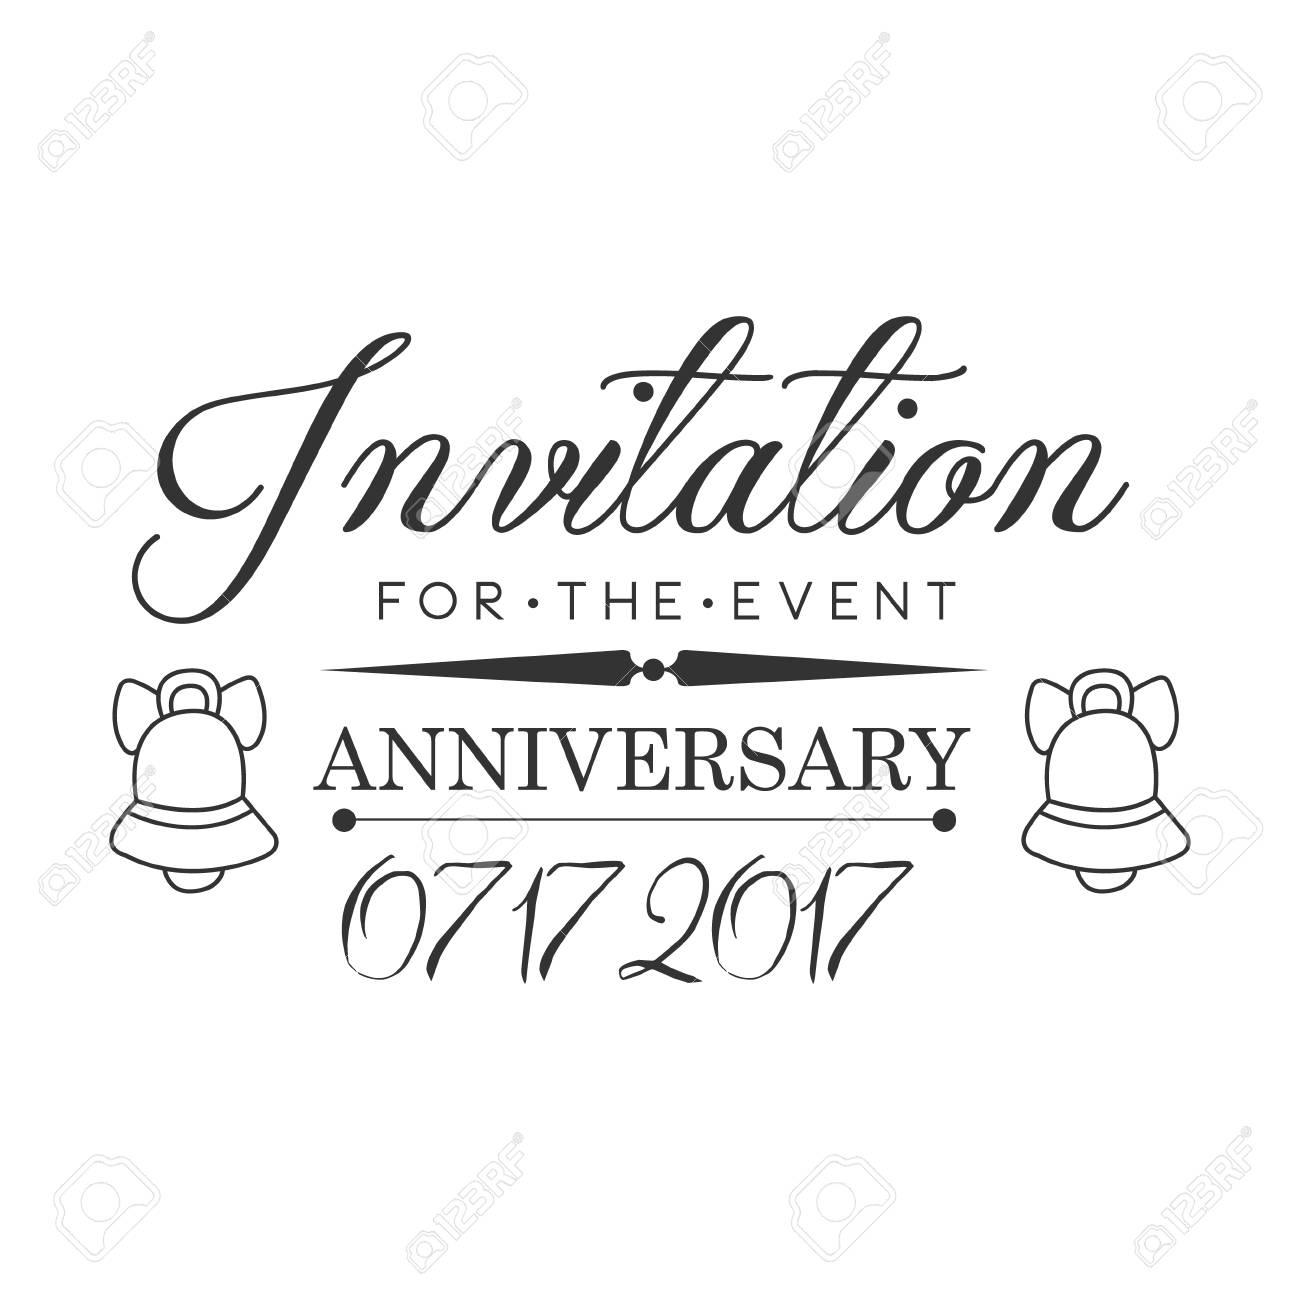 Graduation Anniversary Party Black And White Invitation Card